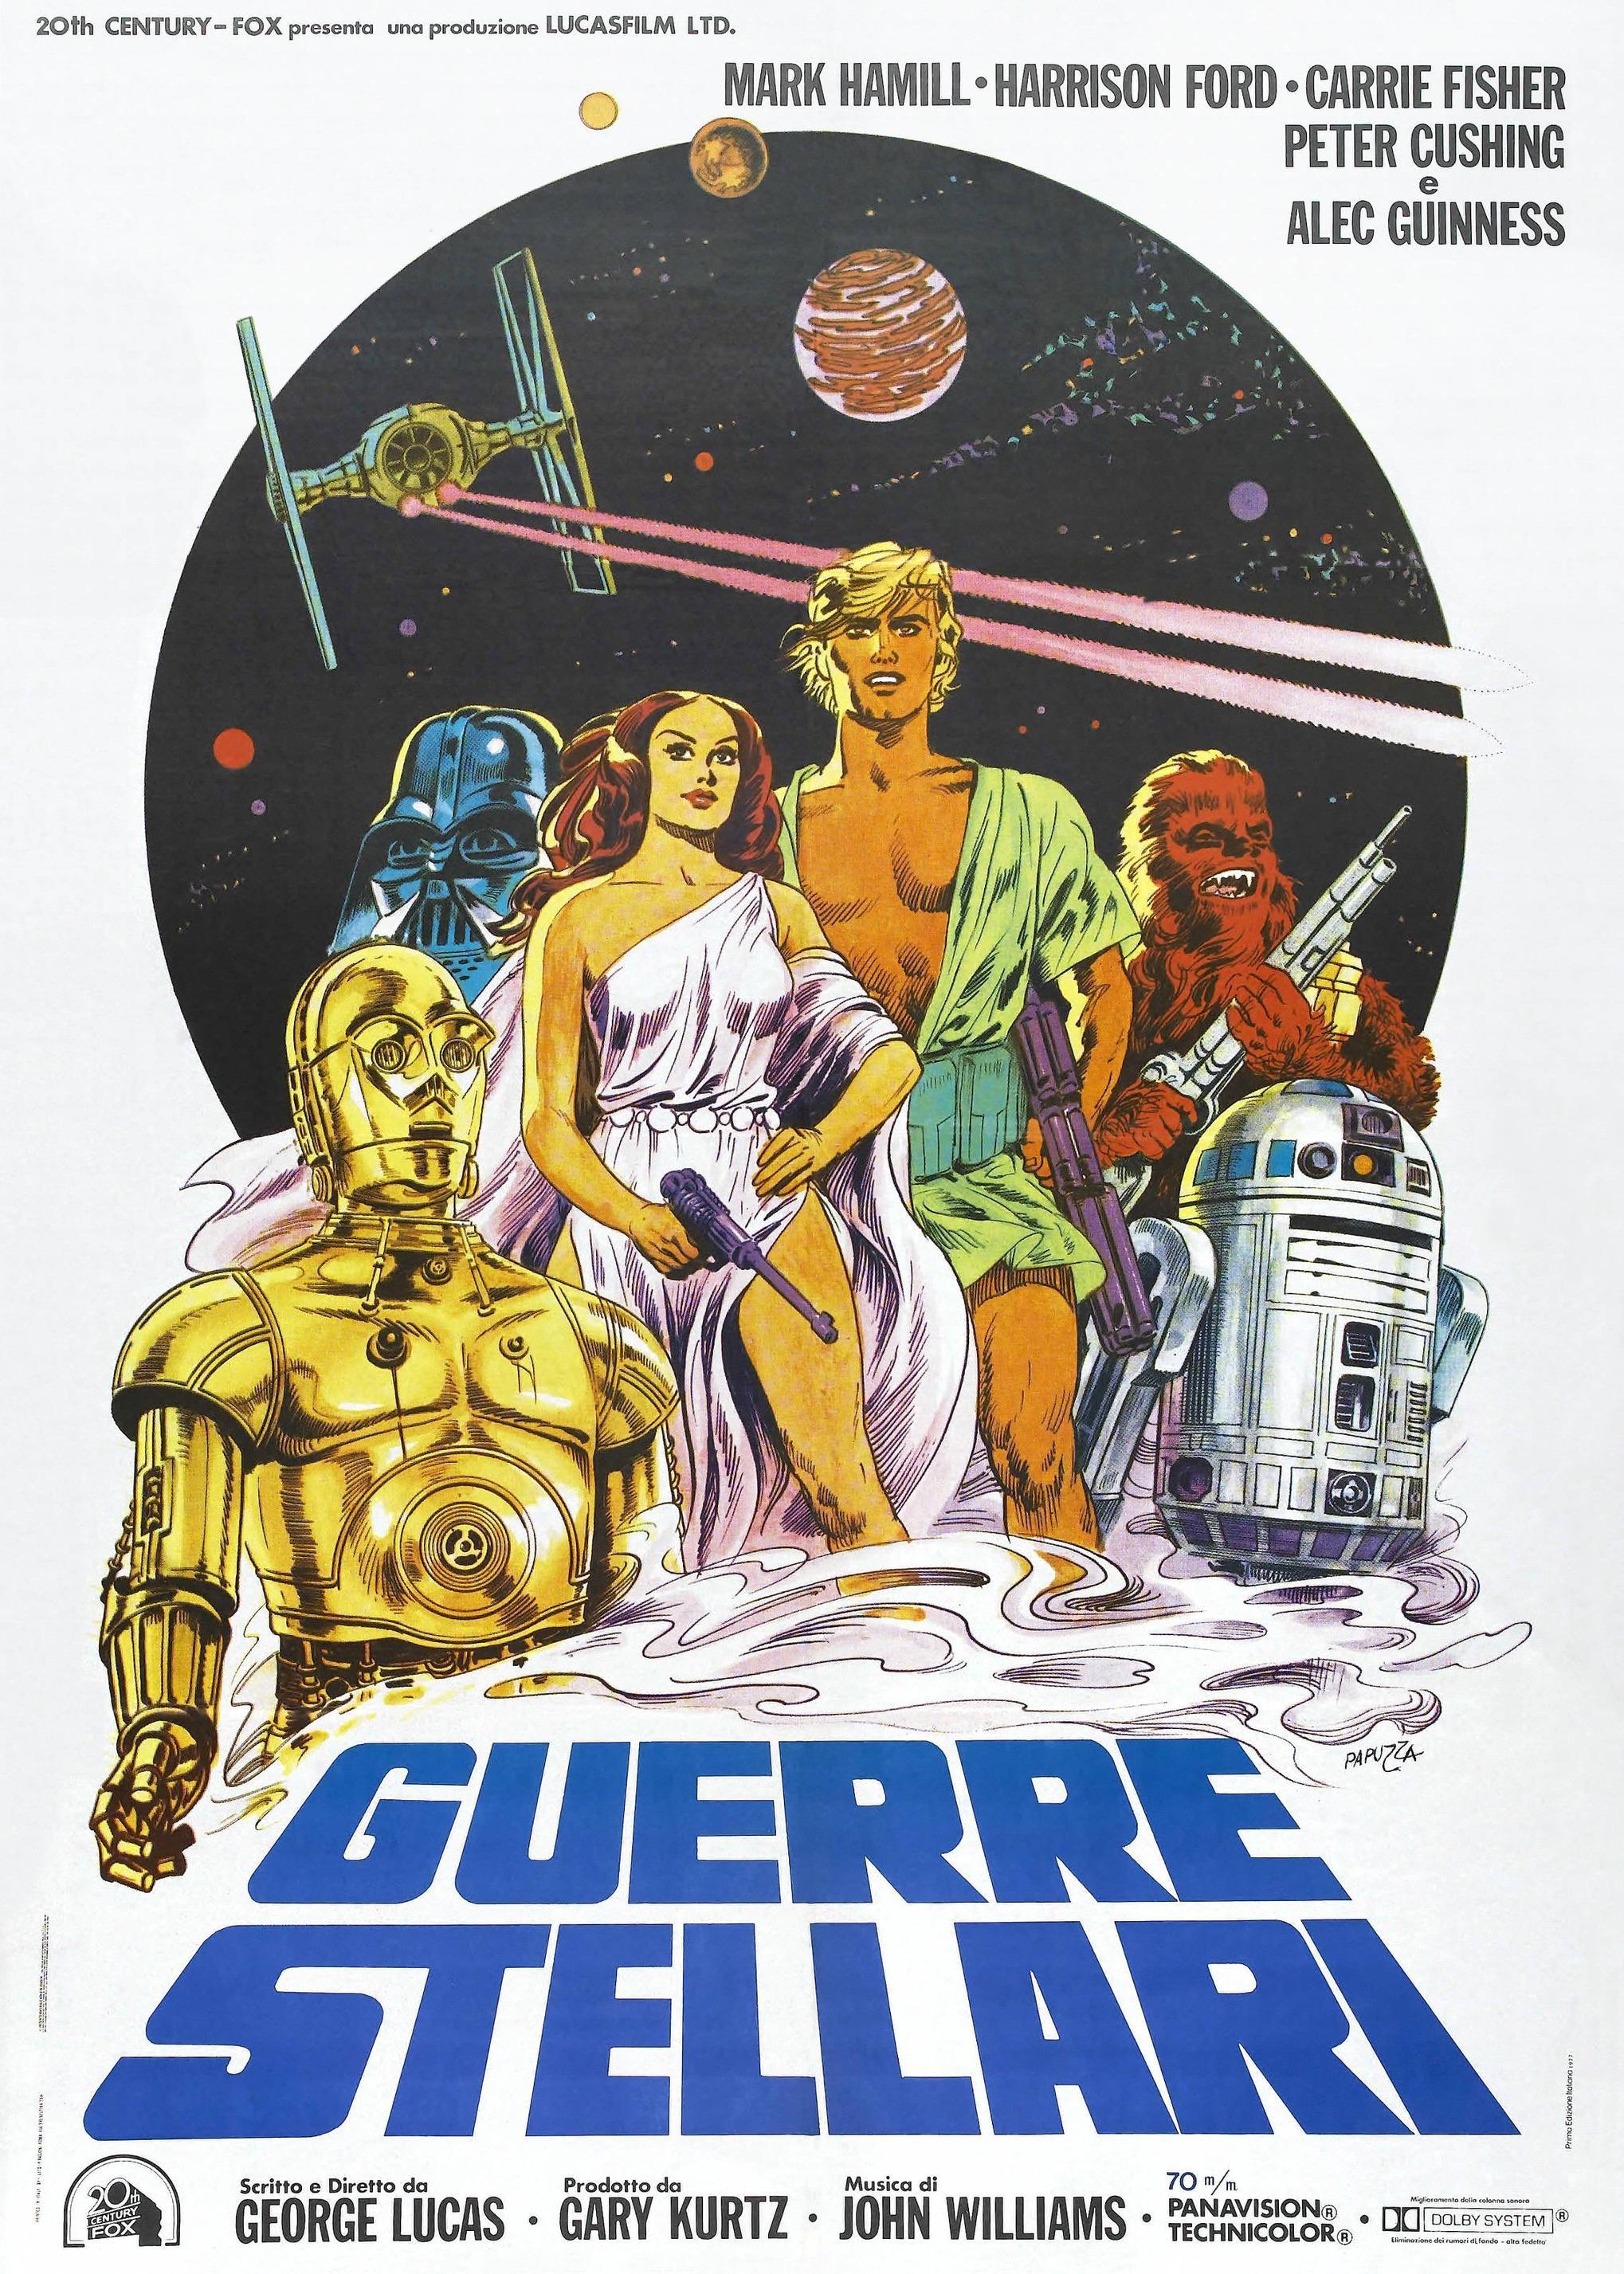 Star Wars A New Hope Italian poster